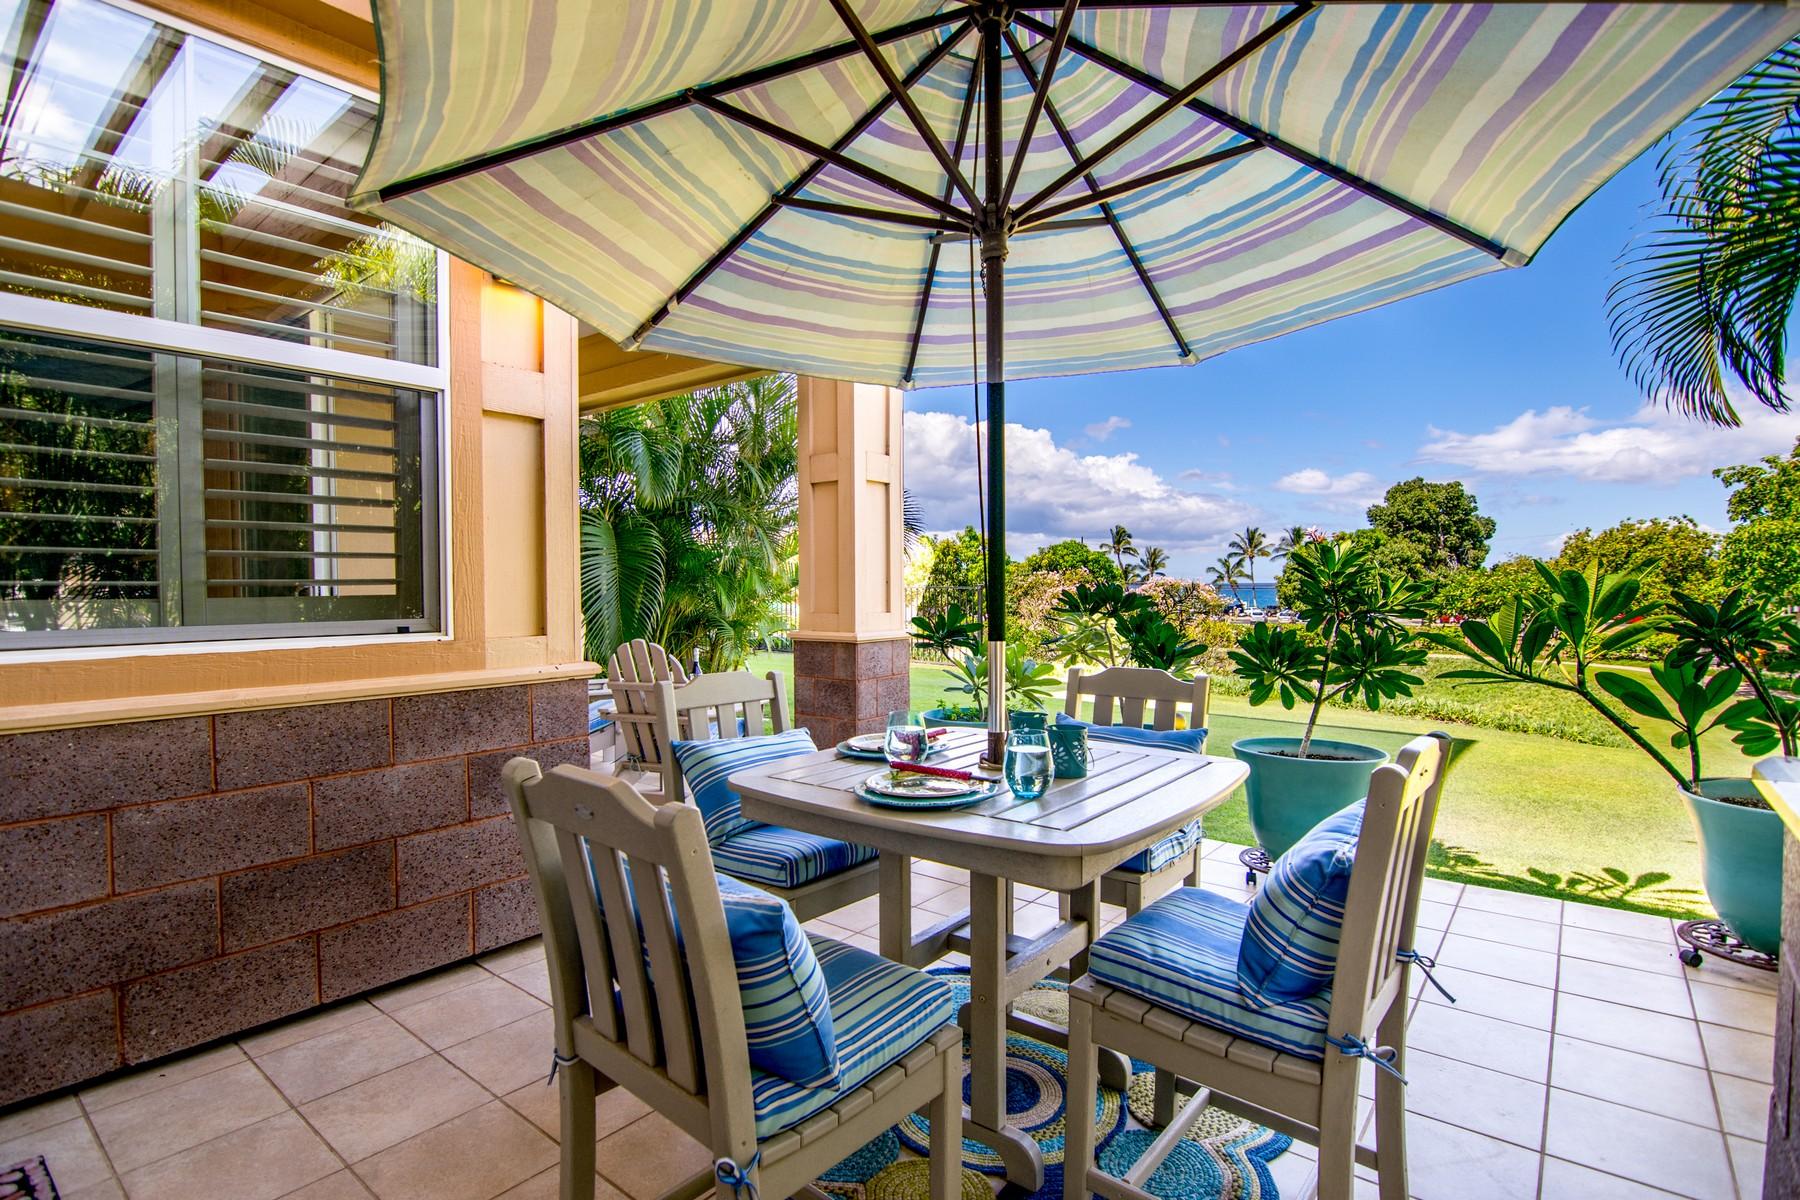 Condomínio para Venda às Live The Island Life 4 Leanihi Lane, Ke Alii Ocean Villas A105 Kihei, Havaí, 96753 Estados Unidos